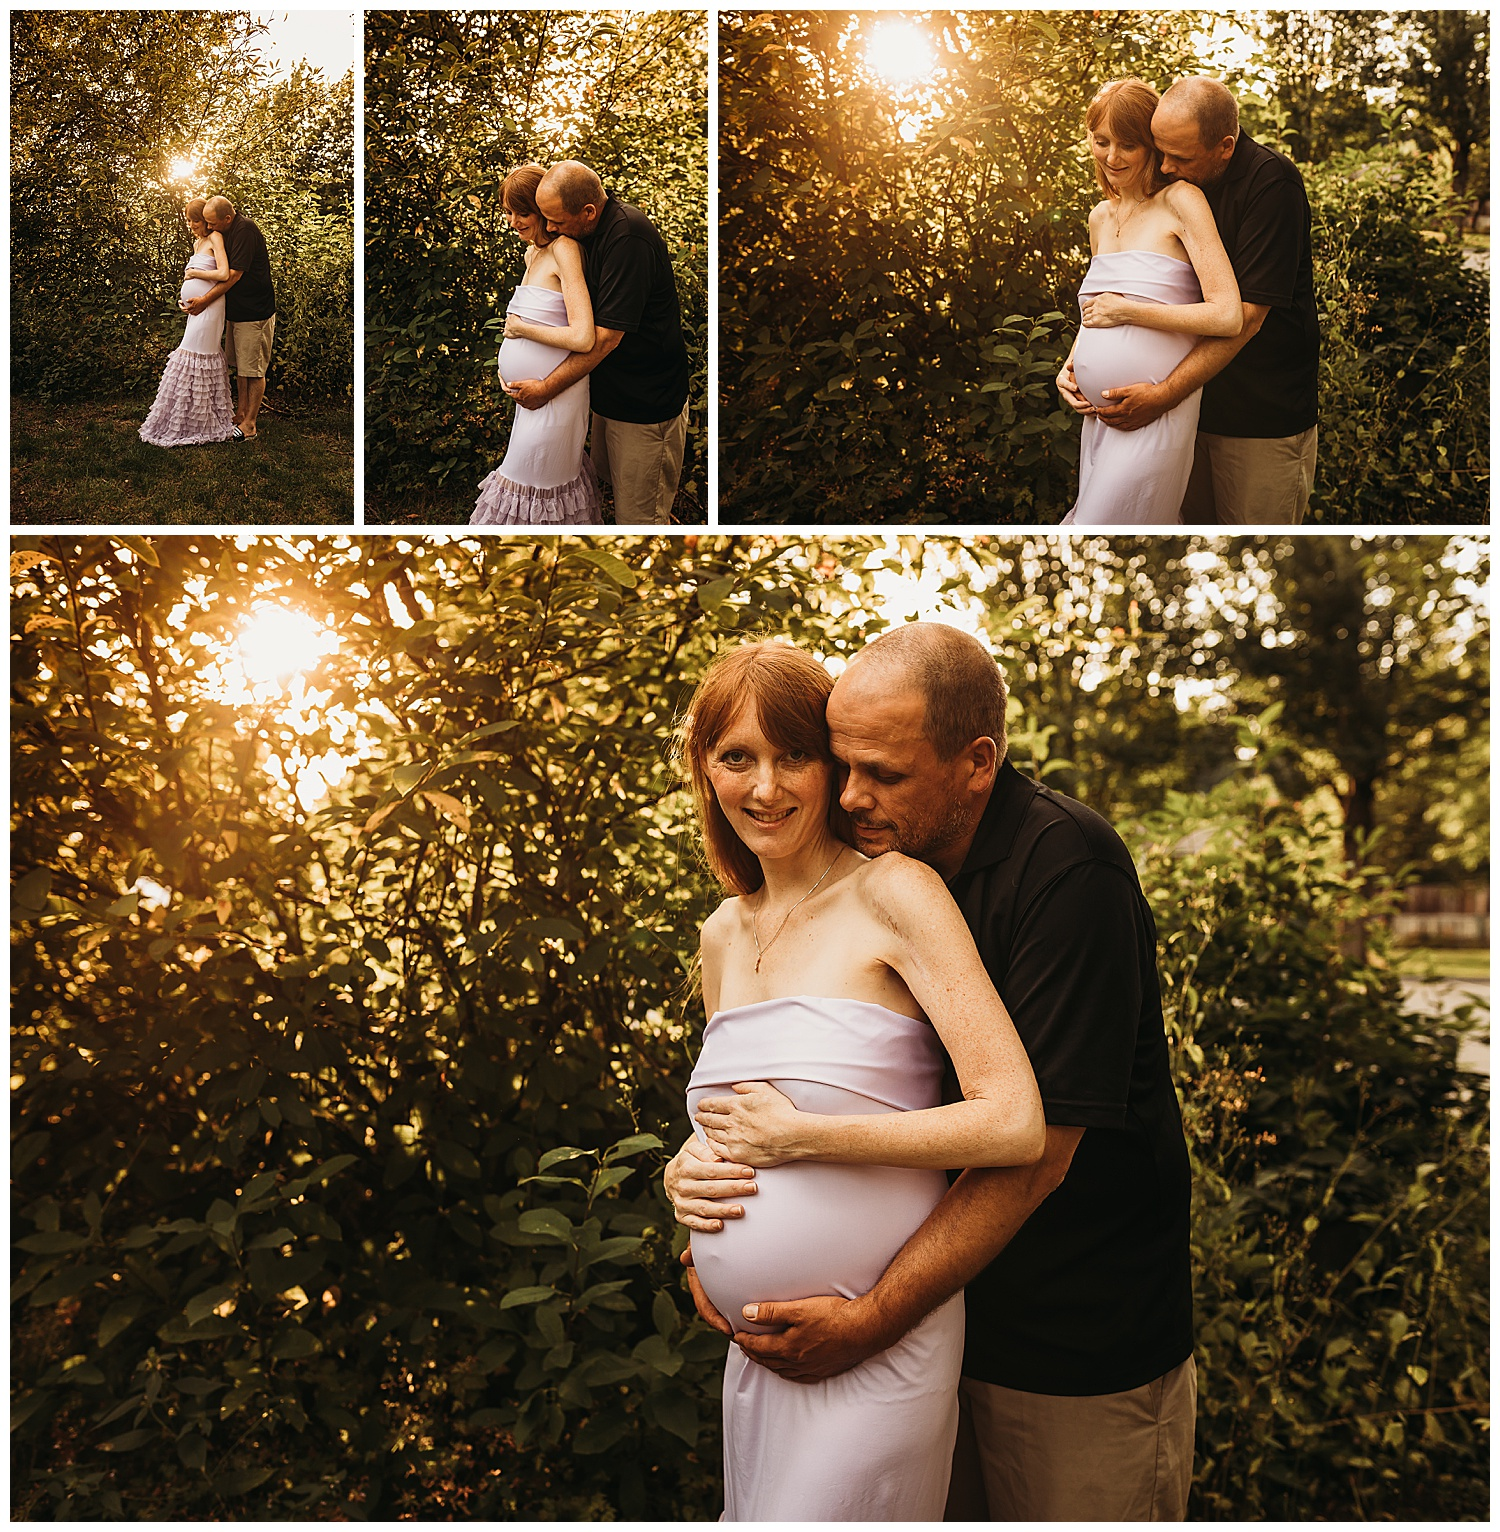 Abbotsford Maternity Anna Hurley Photography 21.jpg